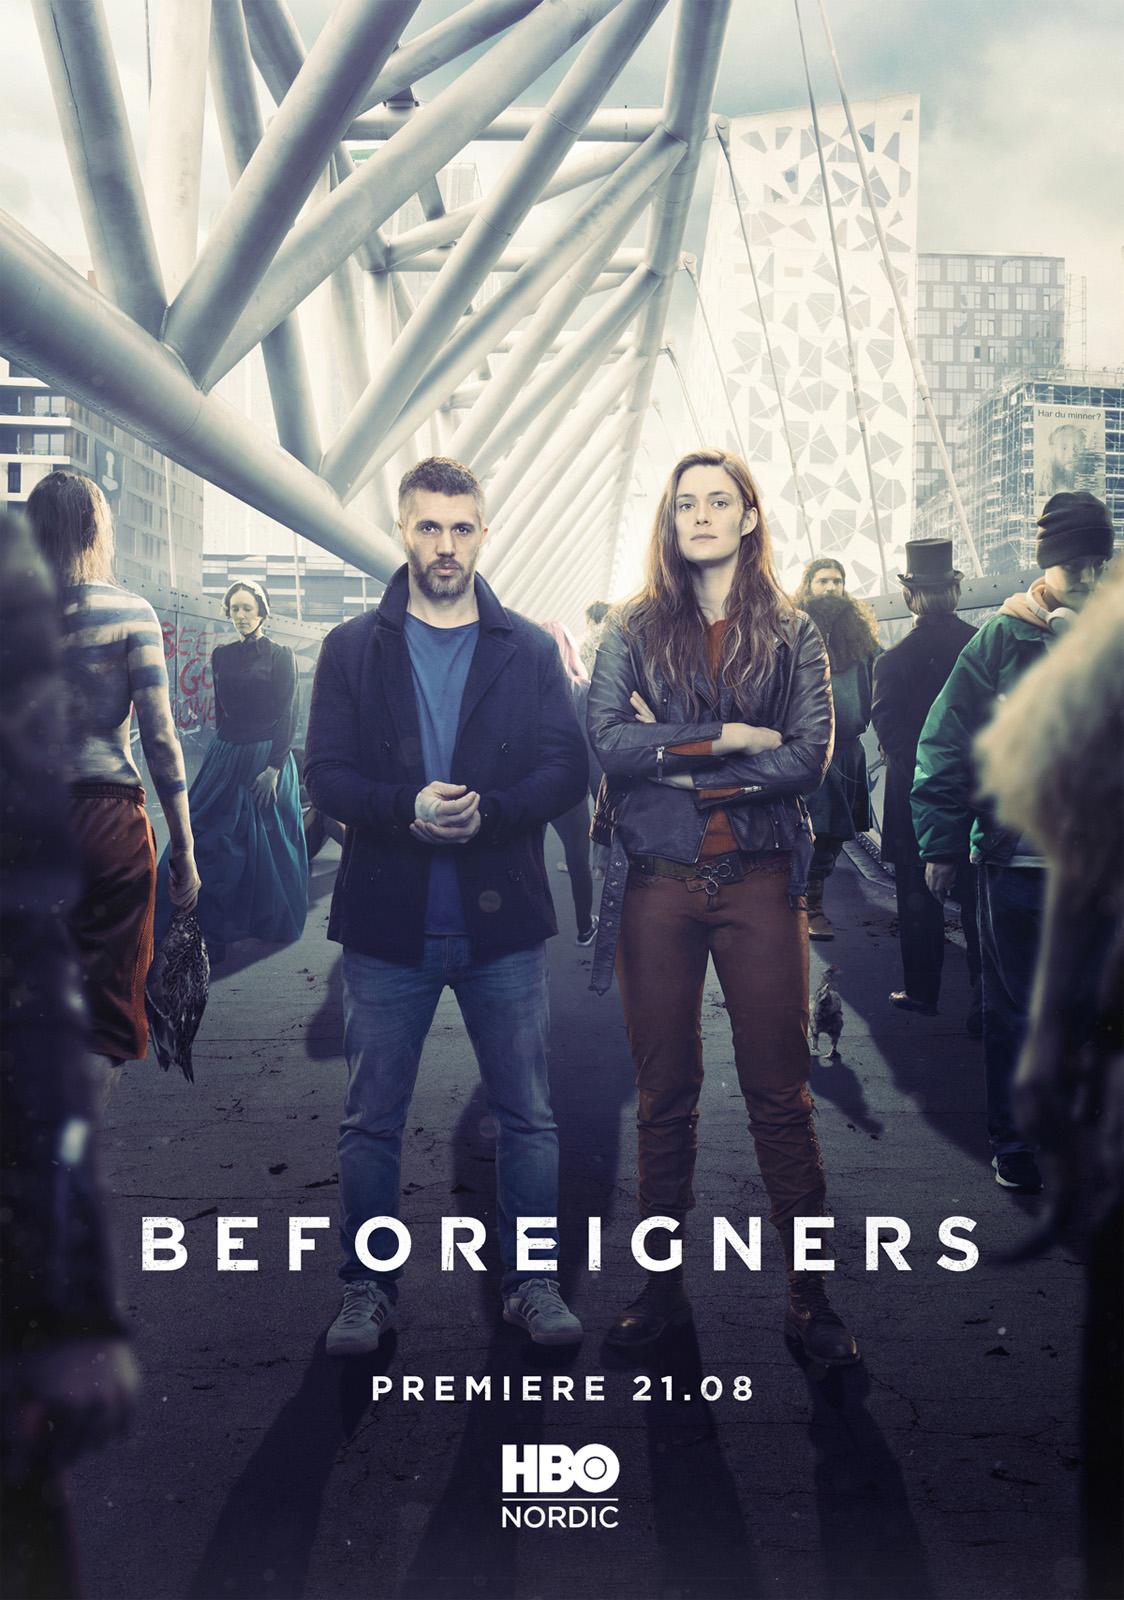 Beforeigners - Mörderische Zeiten - TV-Serie 2019 - FILMSTARTS.de